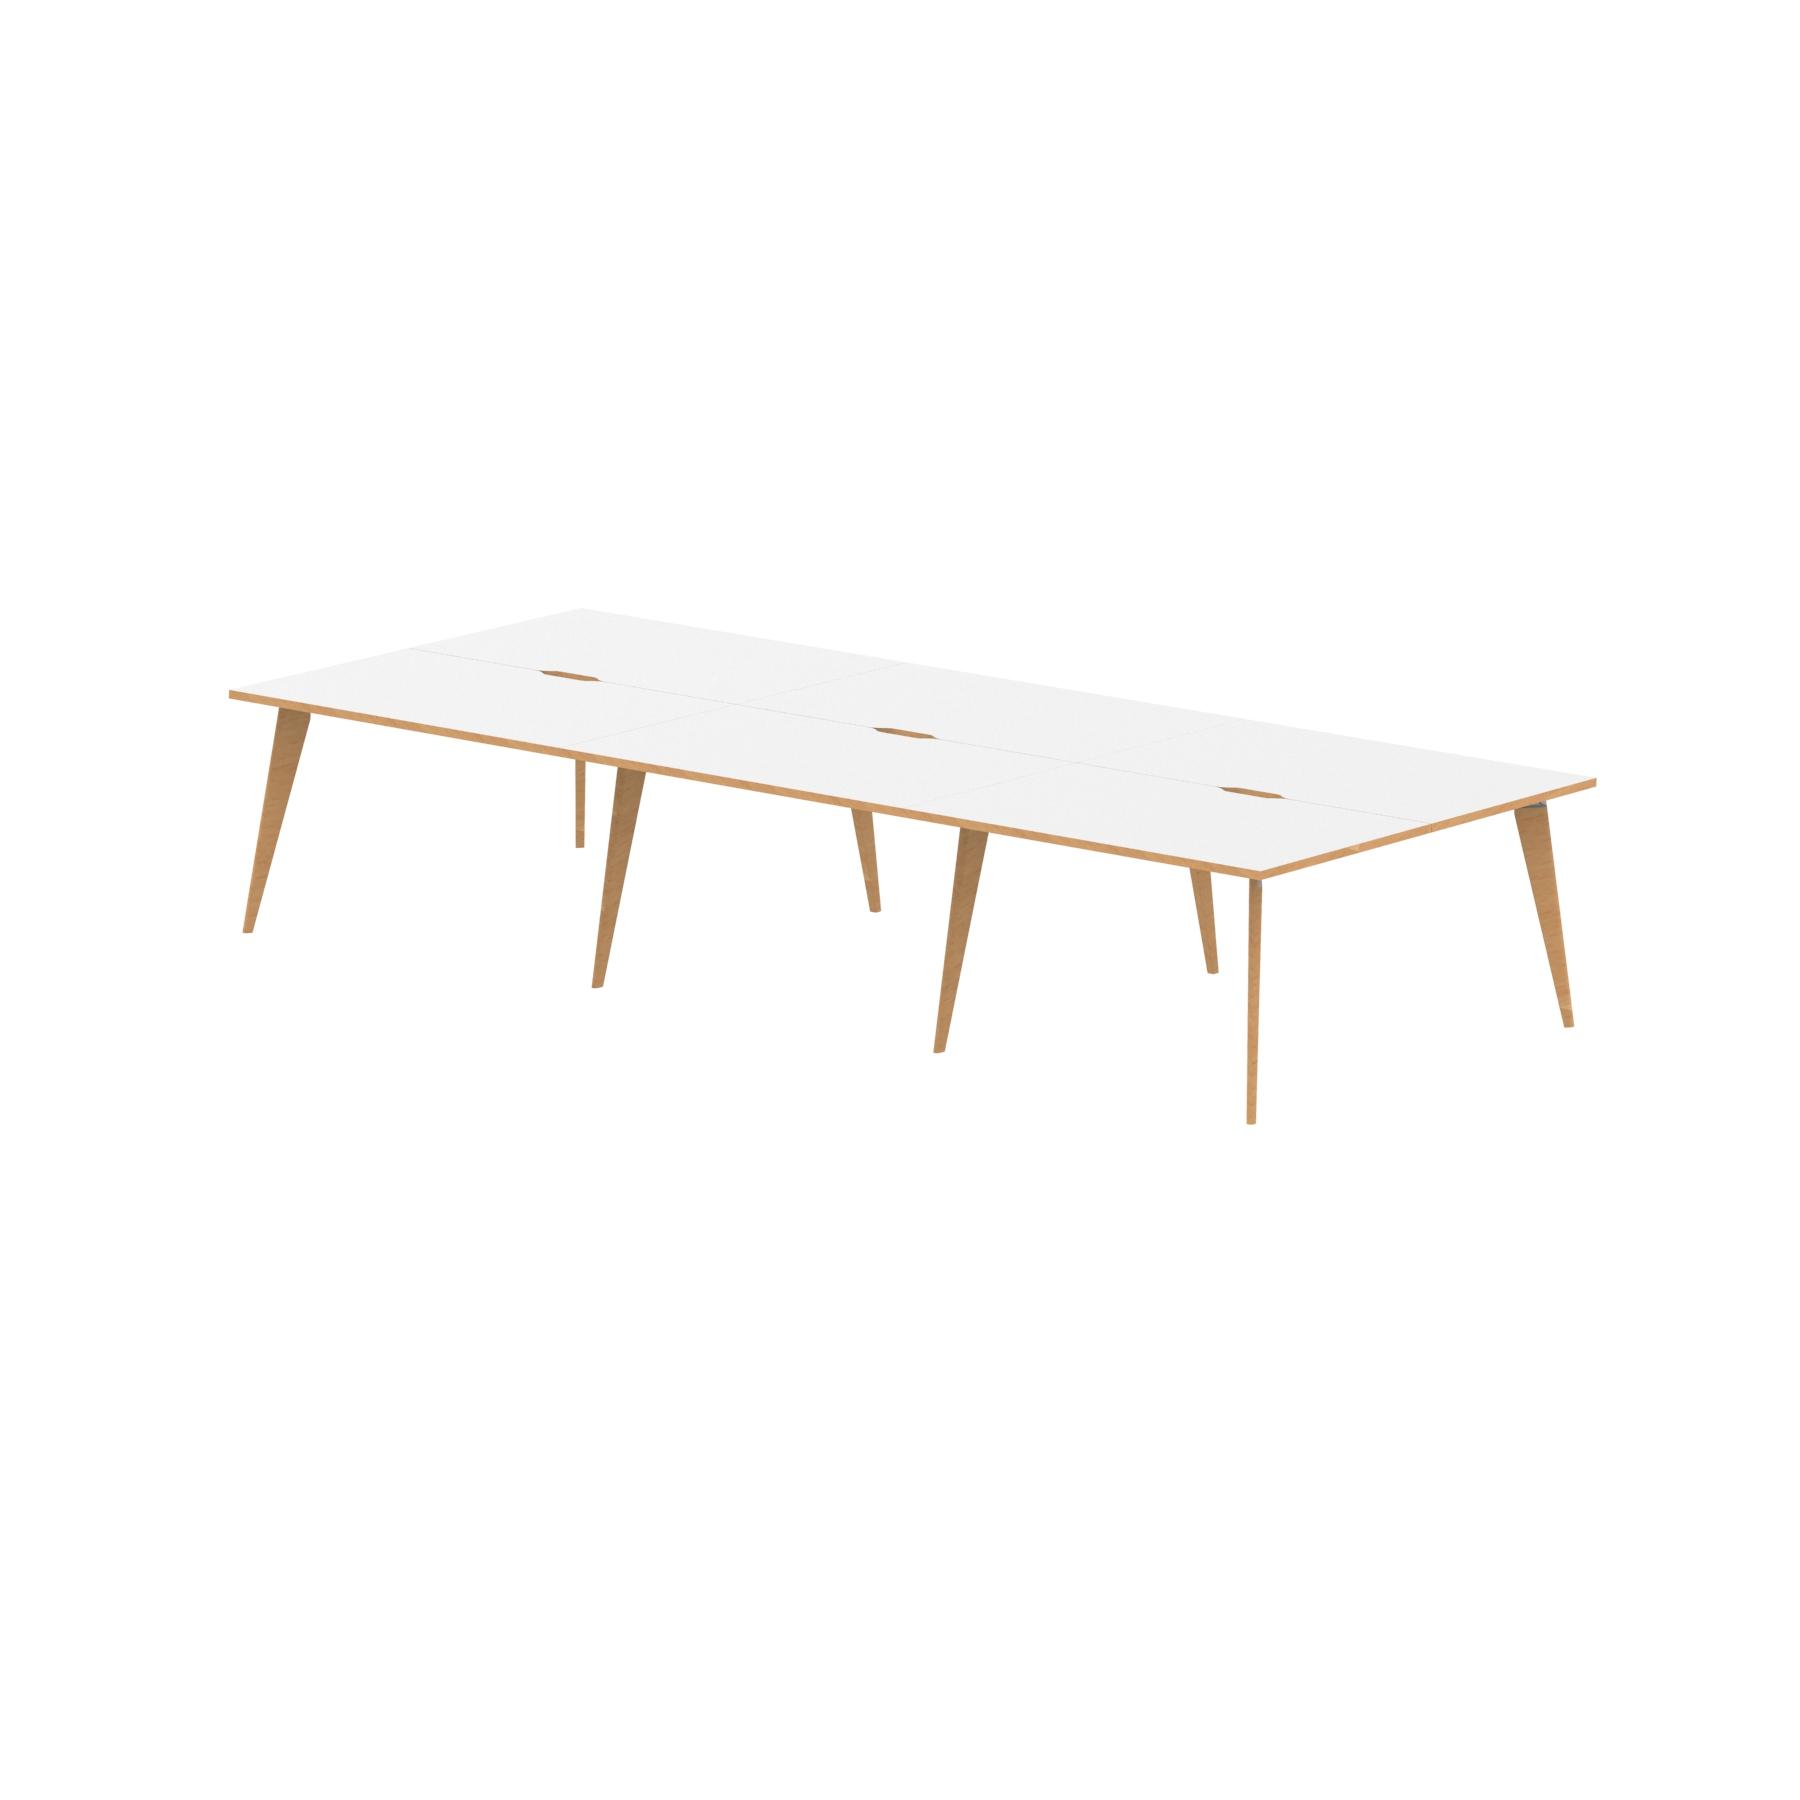 Oslo B2B White Frame Wooden Leg Bench Desk 1200 White With Natural Wood Edge (6 Pod)